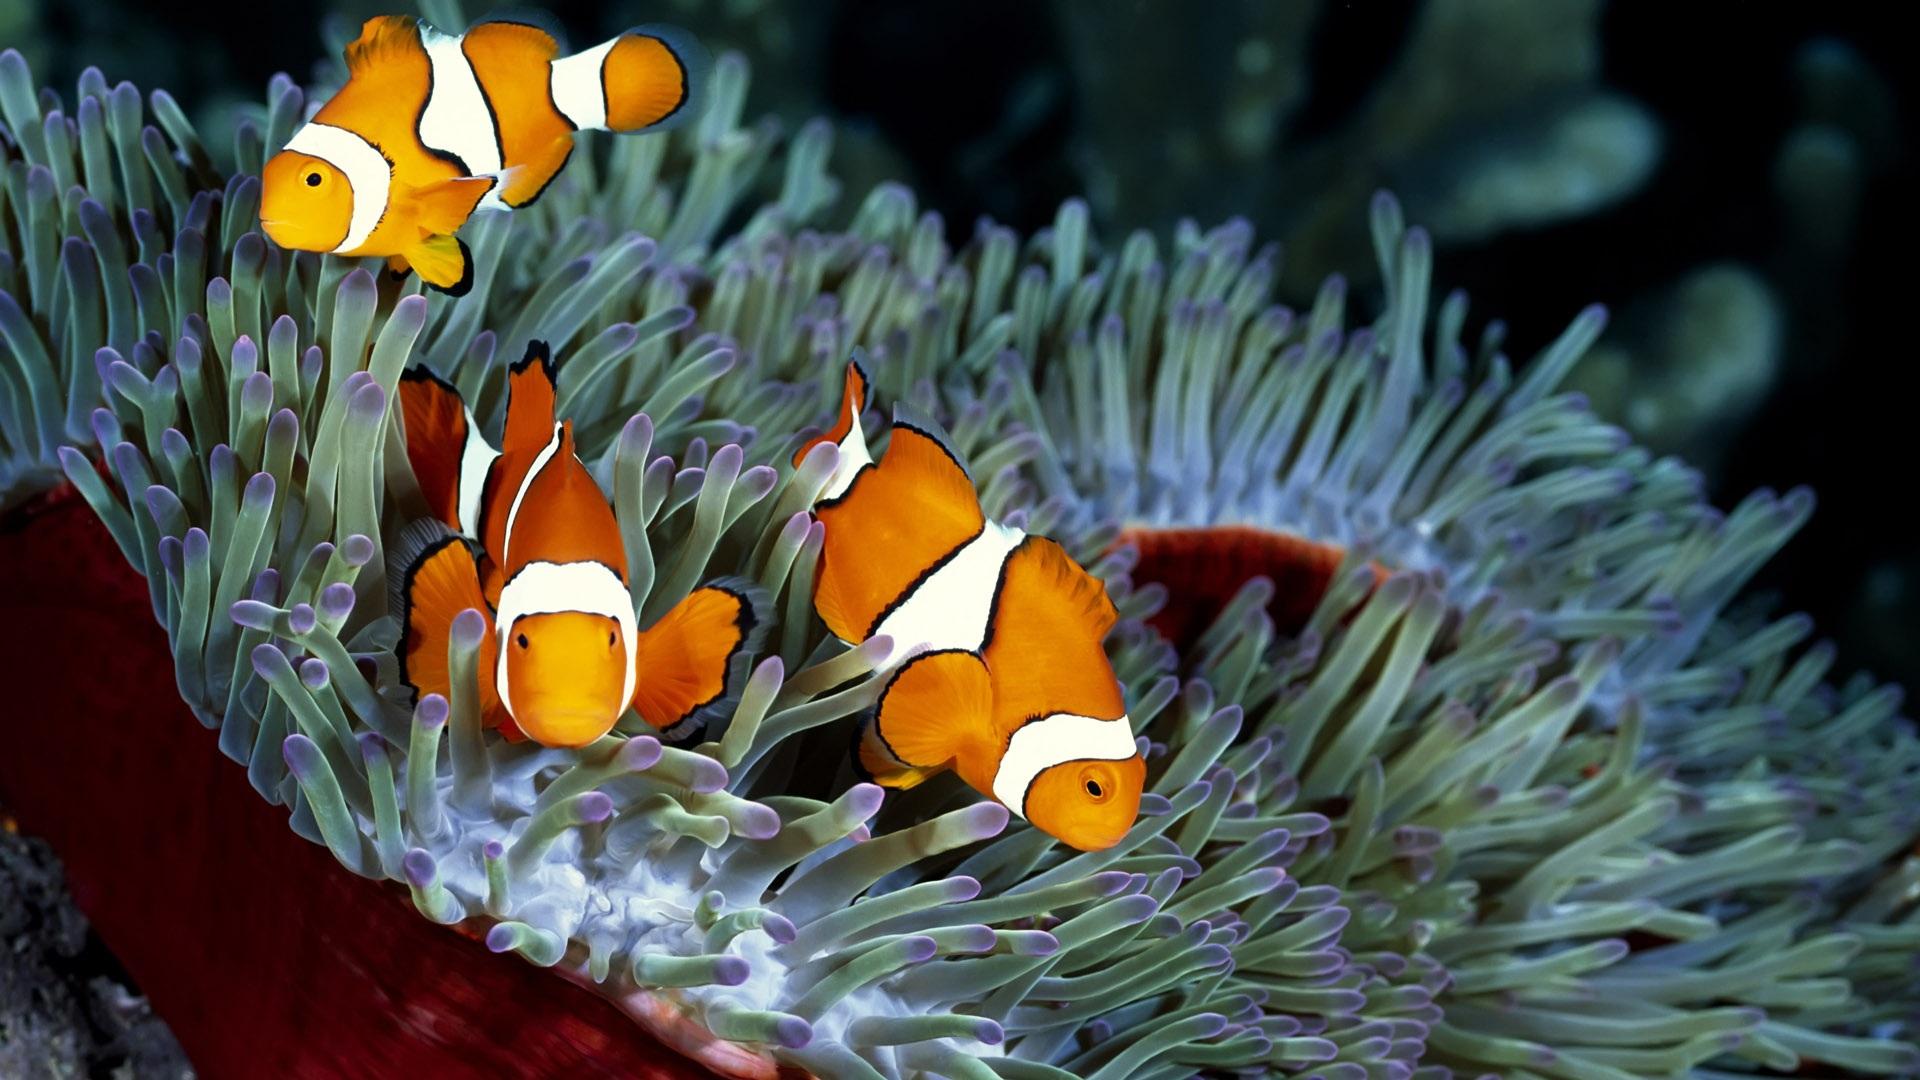 Tropical Fish Ipad Wallpapers Tropical Fish Pic